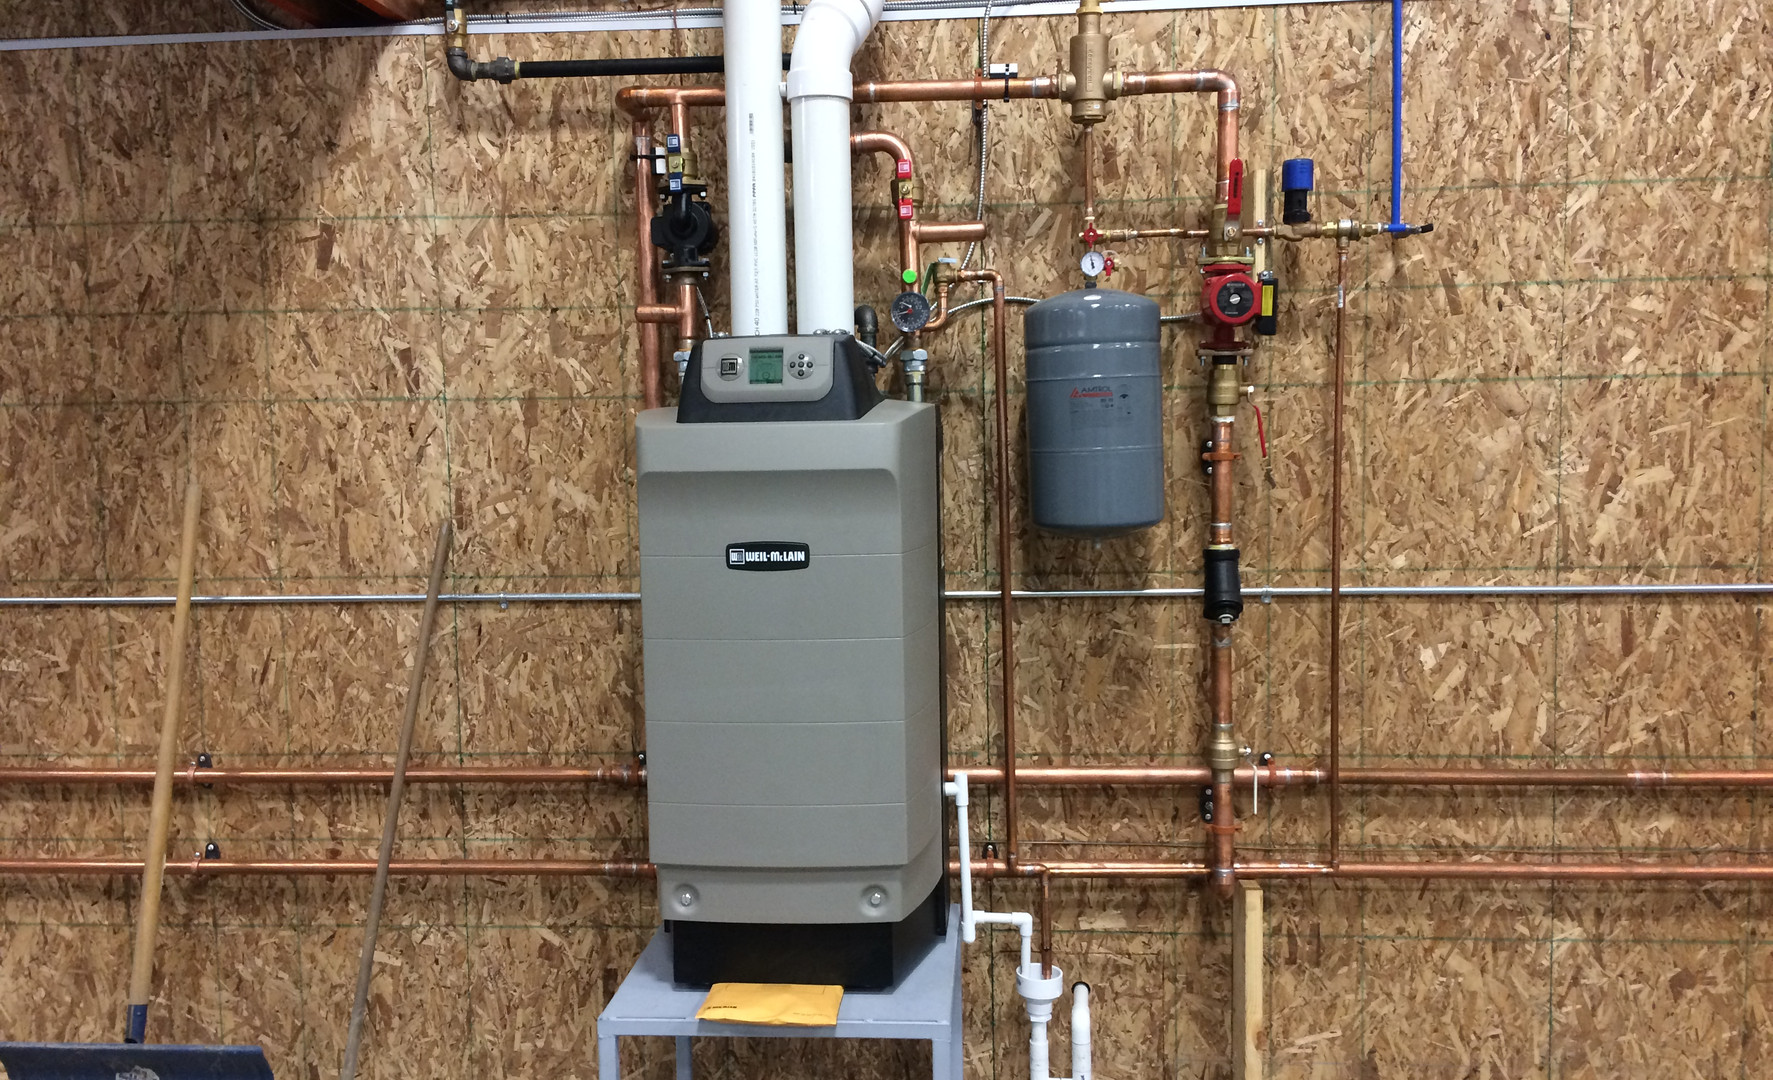 High-efficiency condensing boiler radiant floor heating system installation for a garage